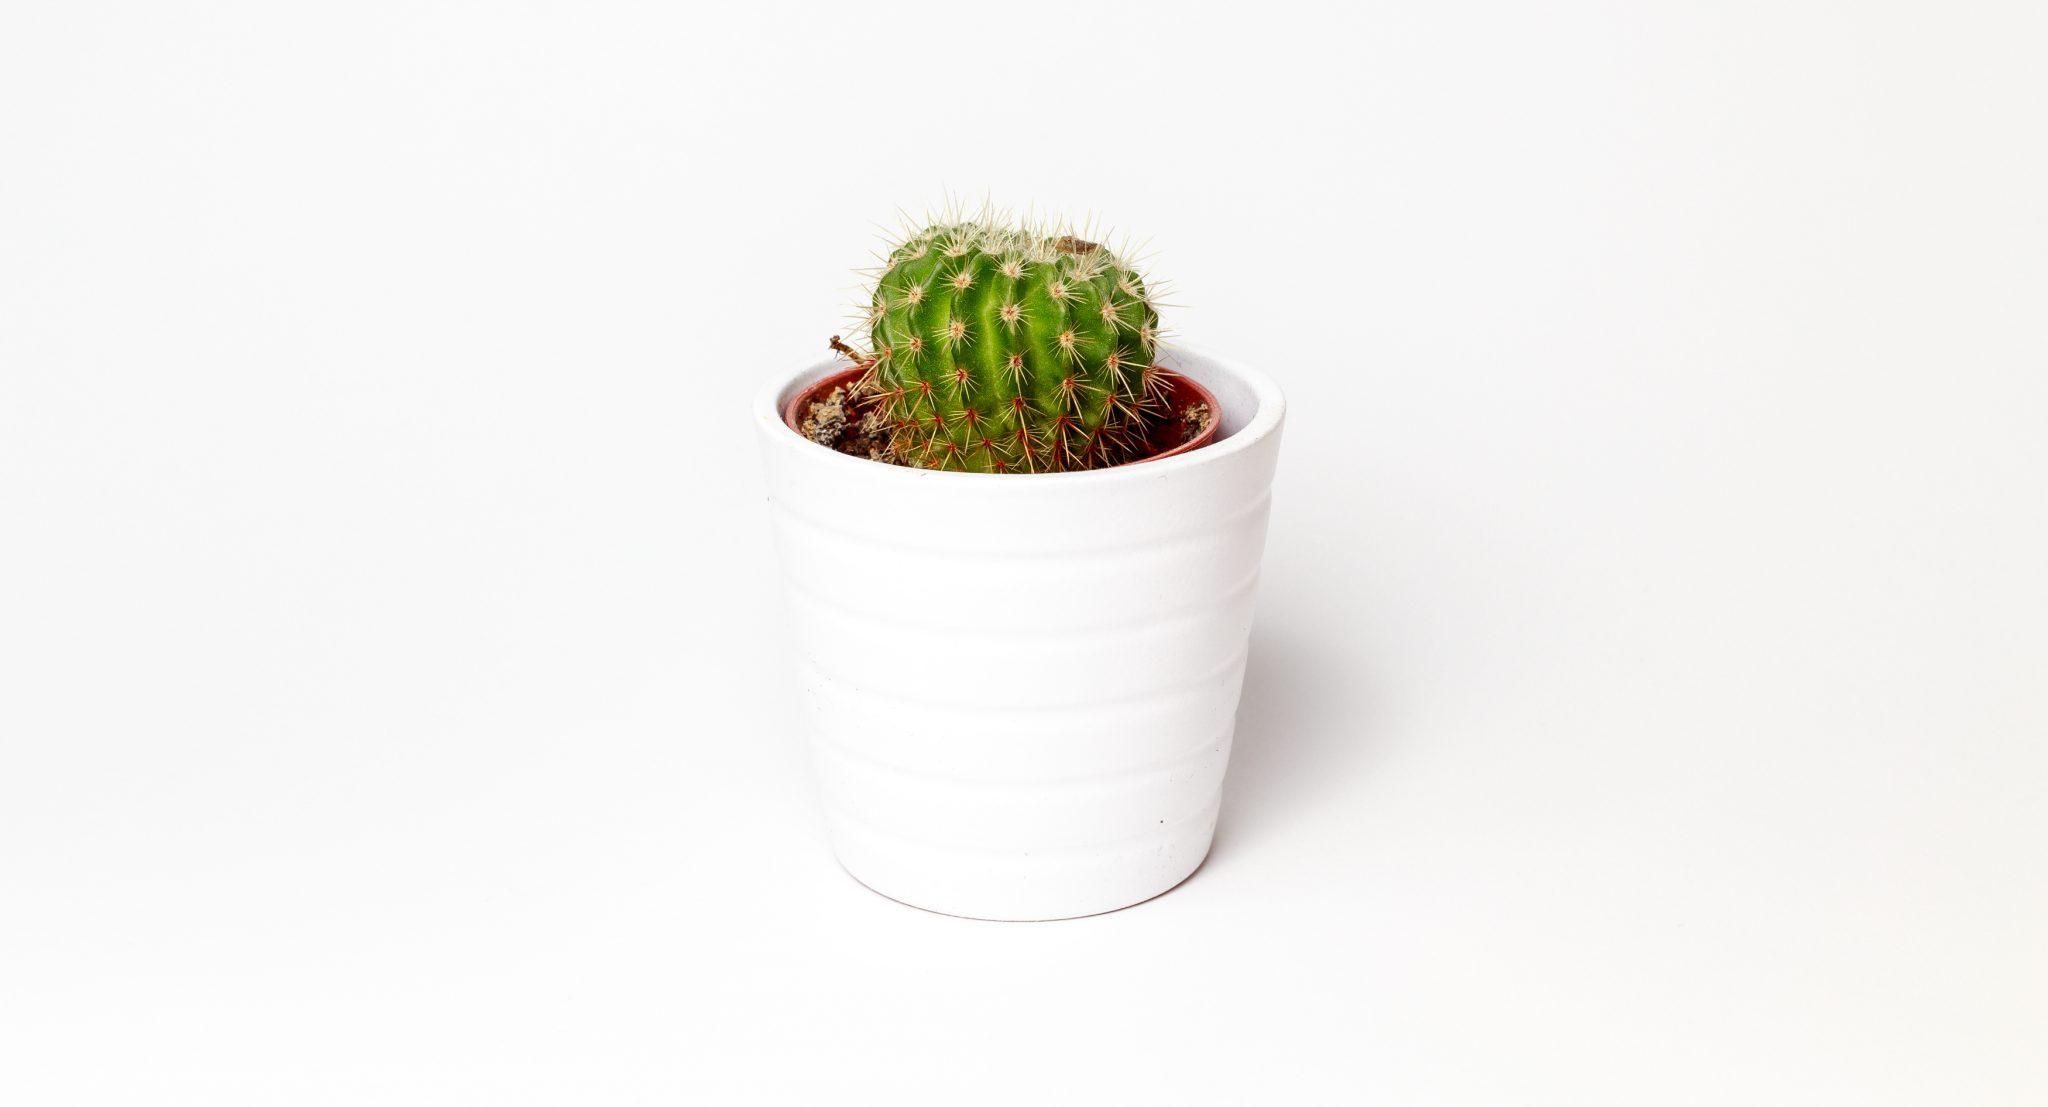 Columna: Mueve tu planta de tiesto